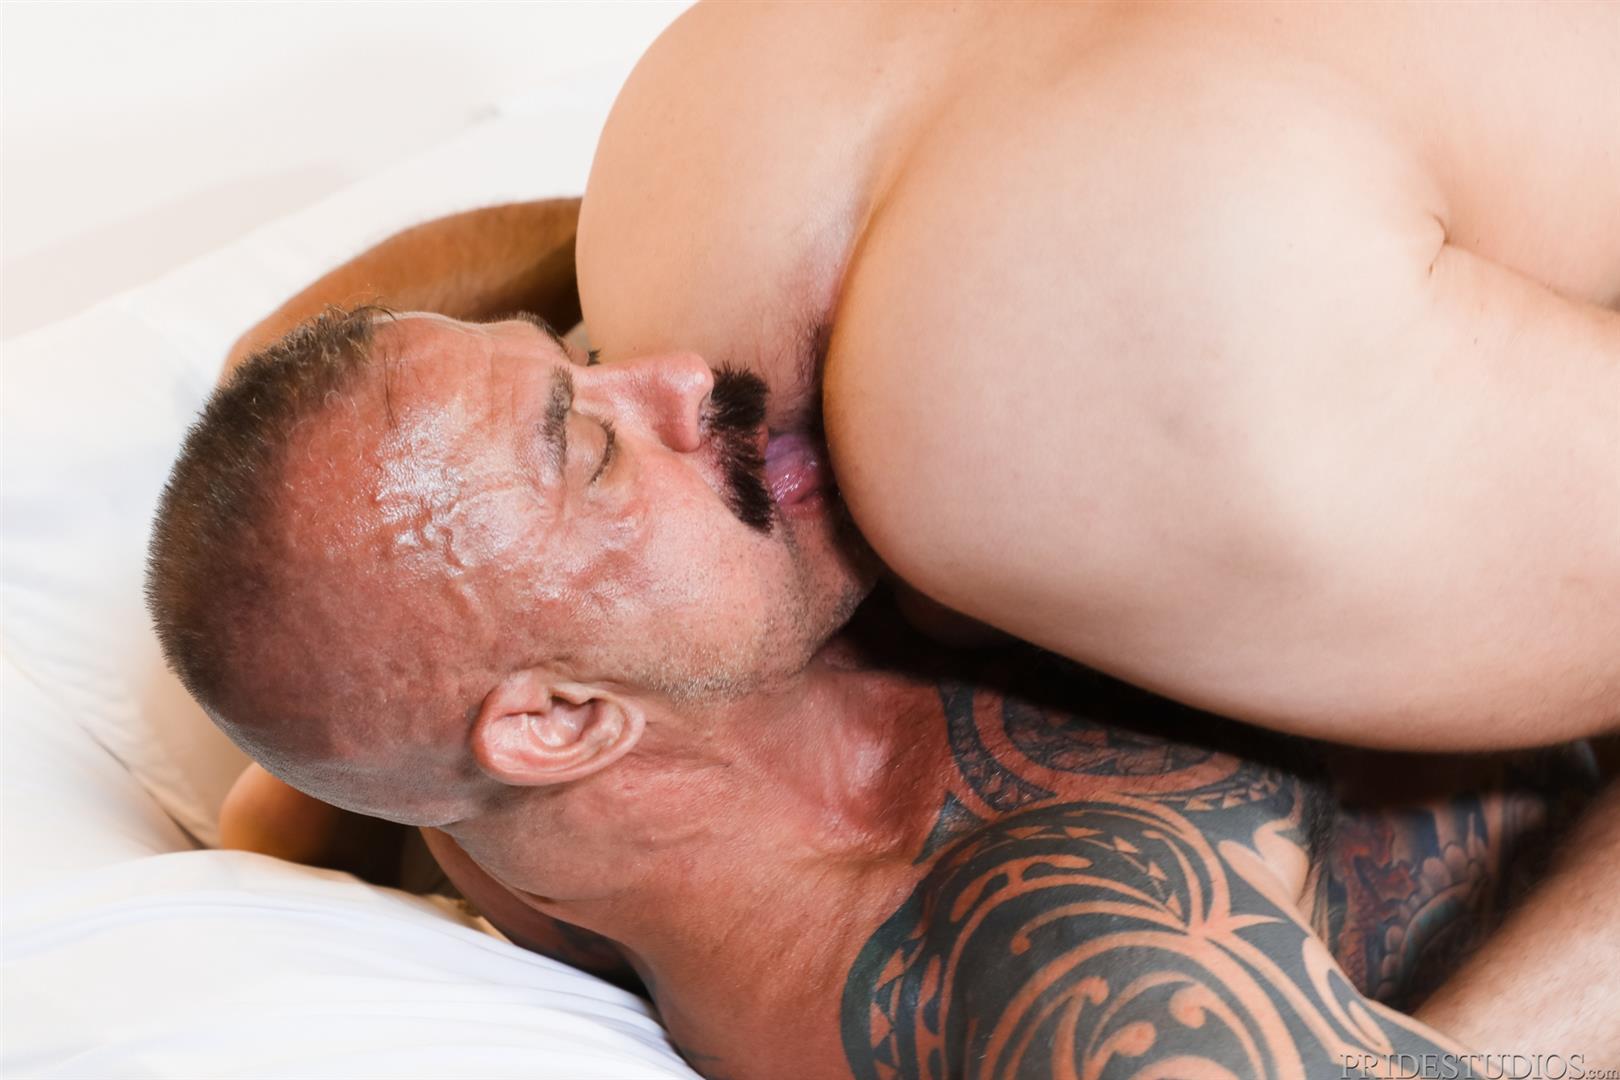 Men-Over-30-Jon-Galt-and-Sean-Harding-Muscle-Daddy-Barebacking-Muscle-Cub-08 Muscle Daddy Jon Galt And Muscle Cub Sean Harding Bareback Flipping